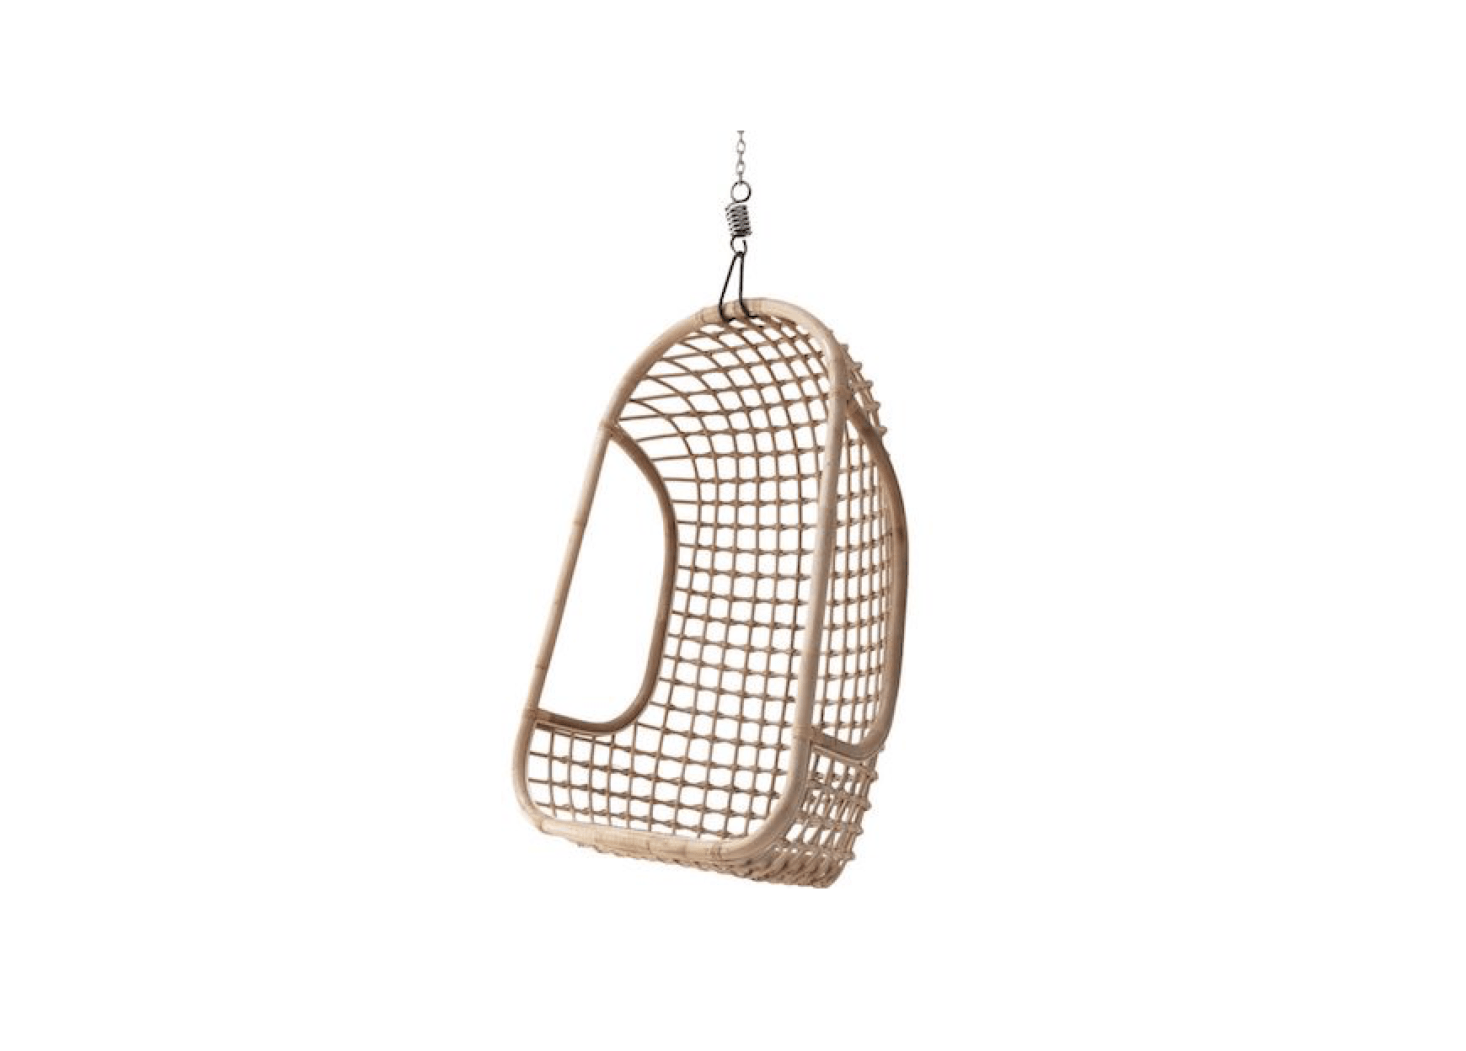 Pleasing 10 Easy Pieces Rattan Hanging Chairs Gardenista Machost Co Dining Chair Design Ideas Machostcouk